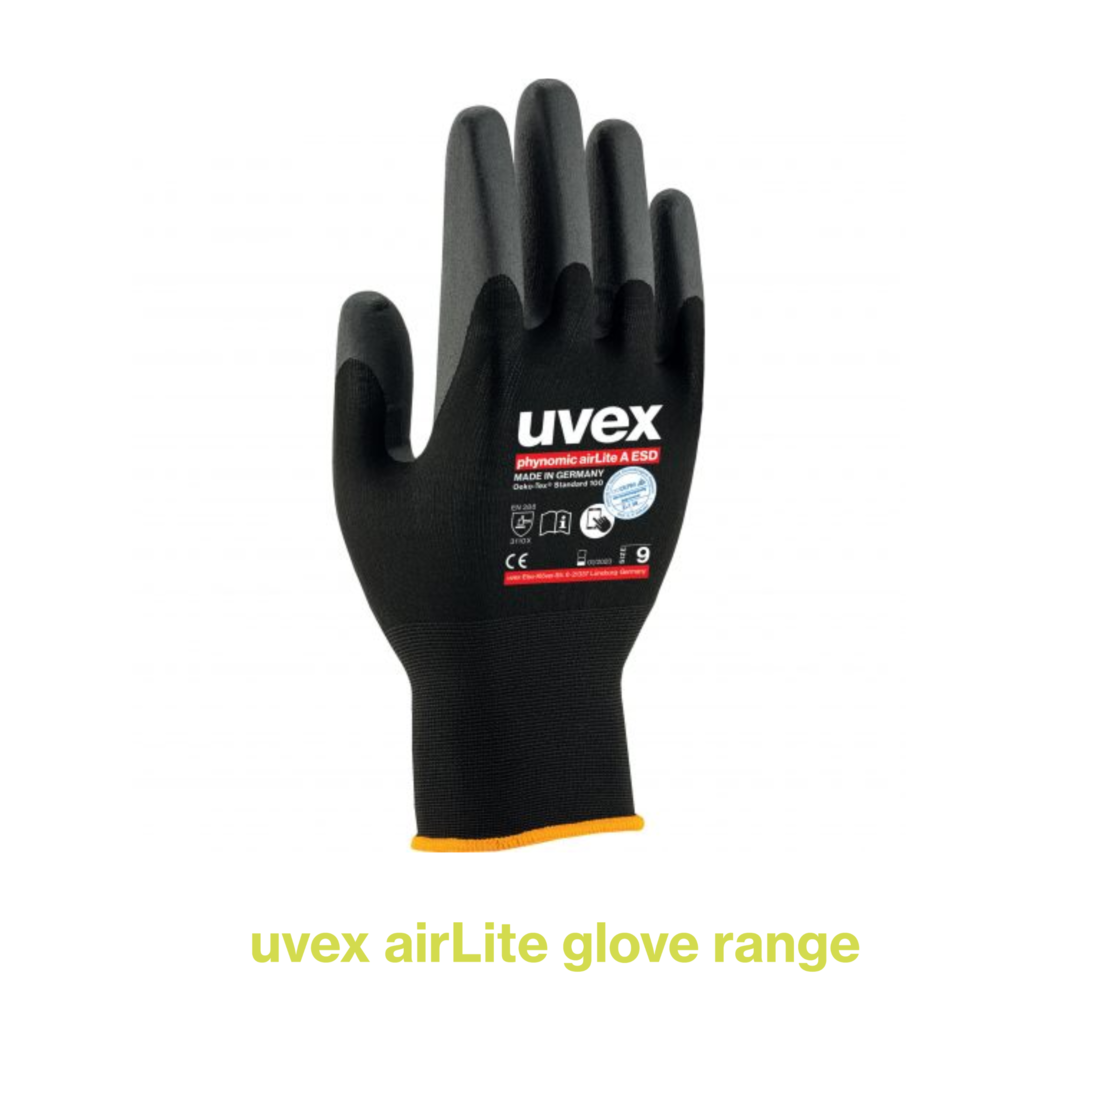 uvex airlite gloves